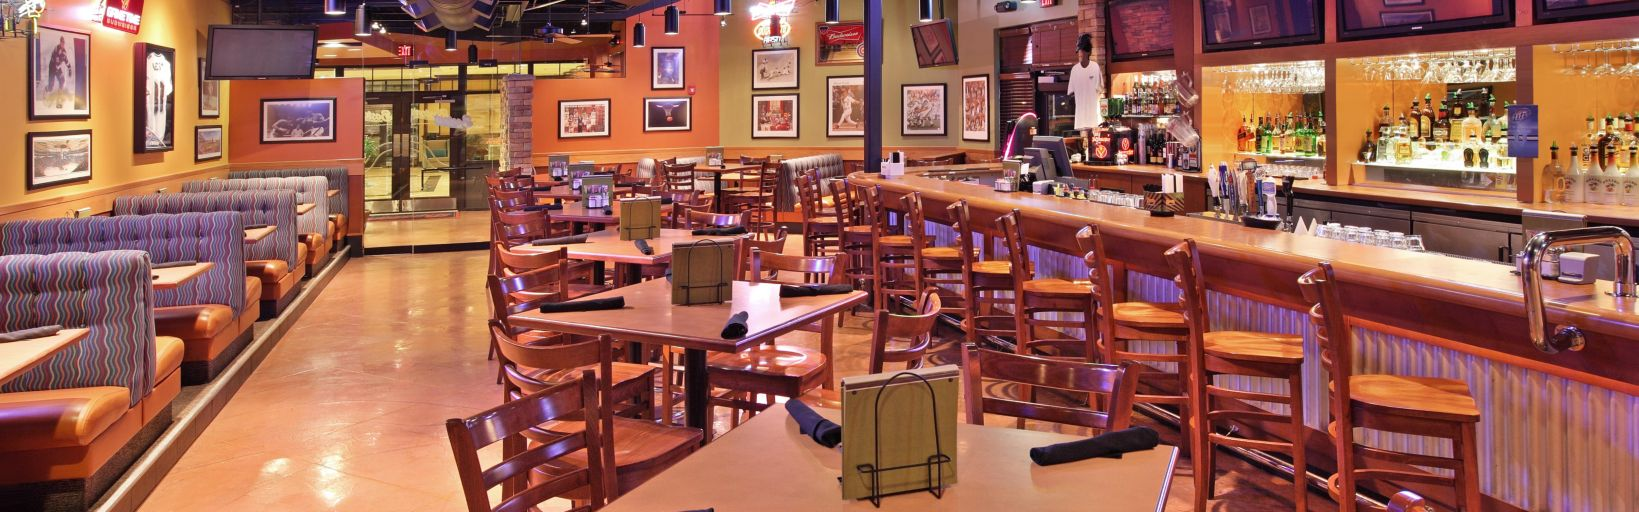 Boston 39 S Restaurant And Sports Bar Has Terrific